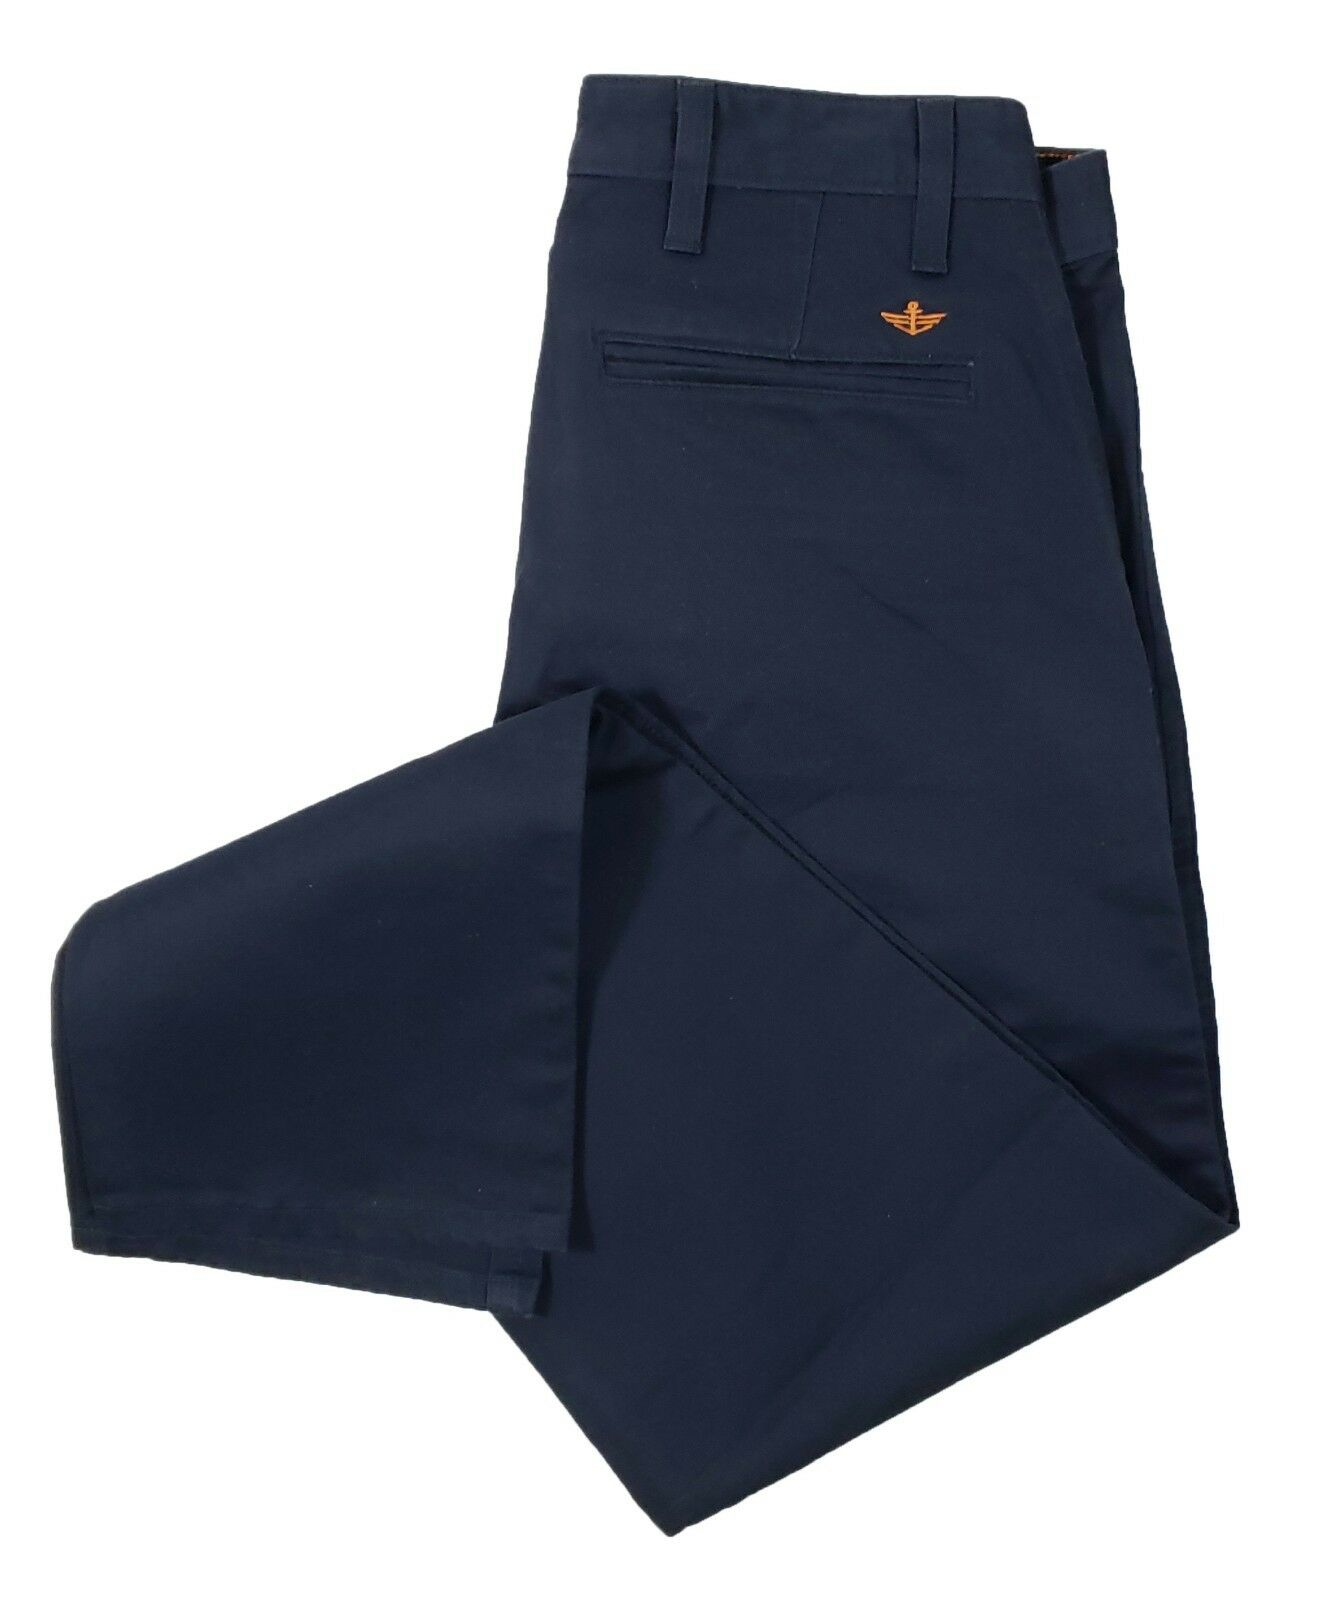 Dockers Men's Navy Alpha Slim Athletic Fit Chino Pants